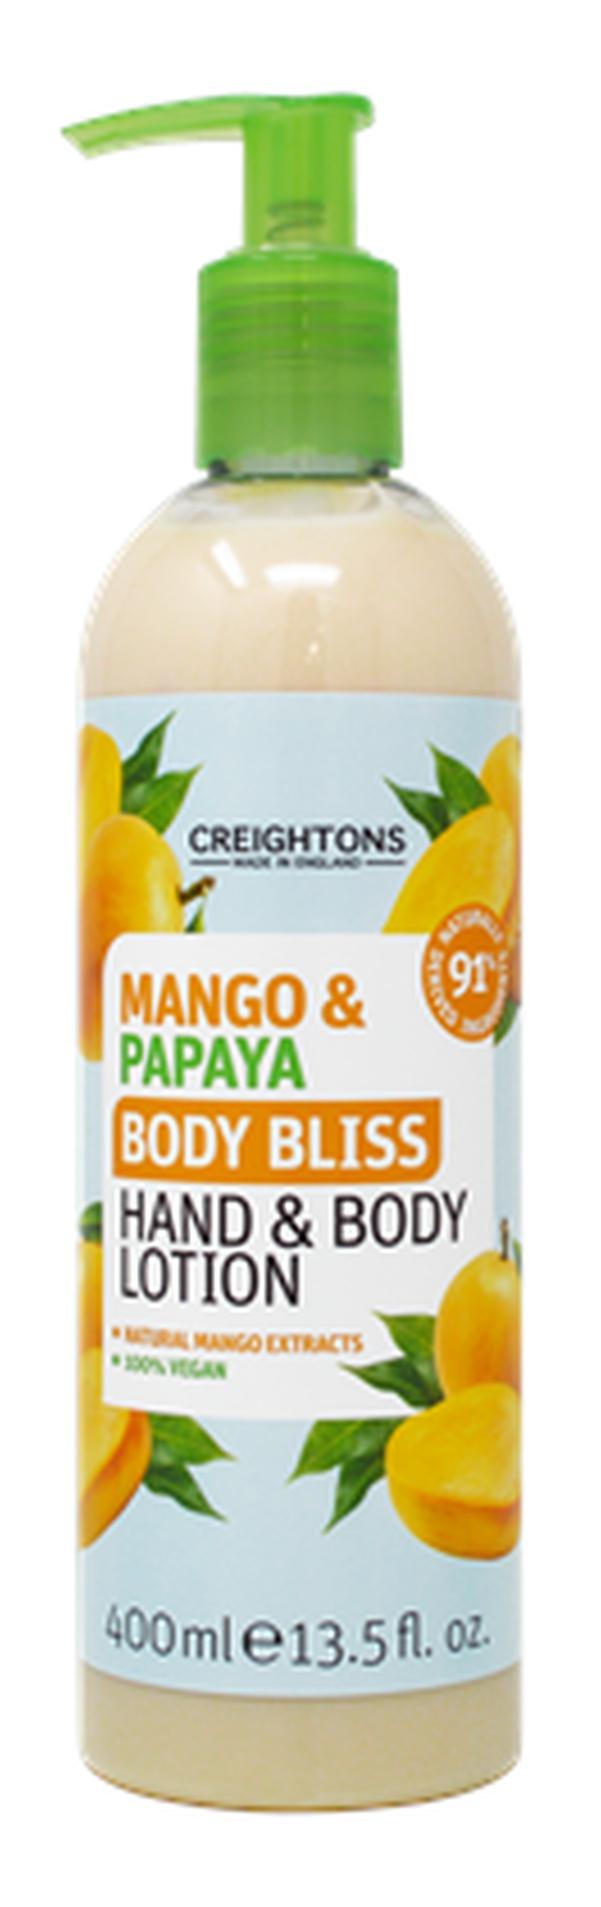 Creightons Mango & Papaya Body Bliss Hand & Body Lotion